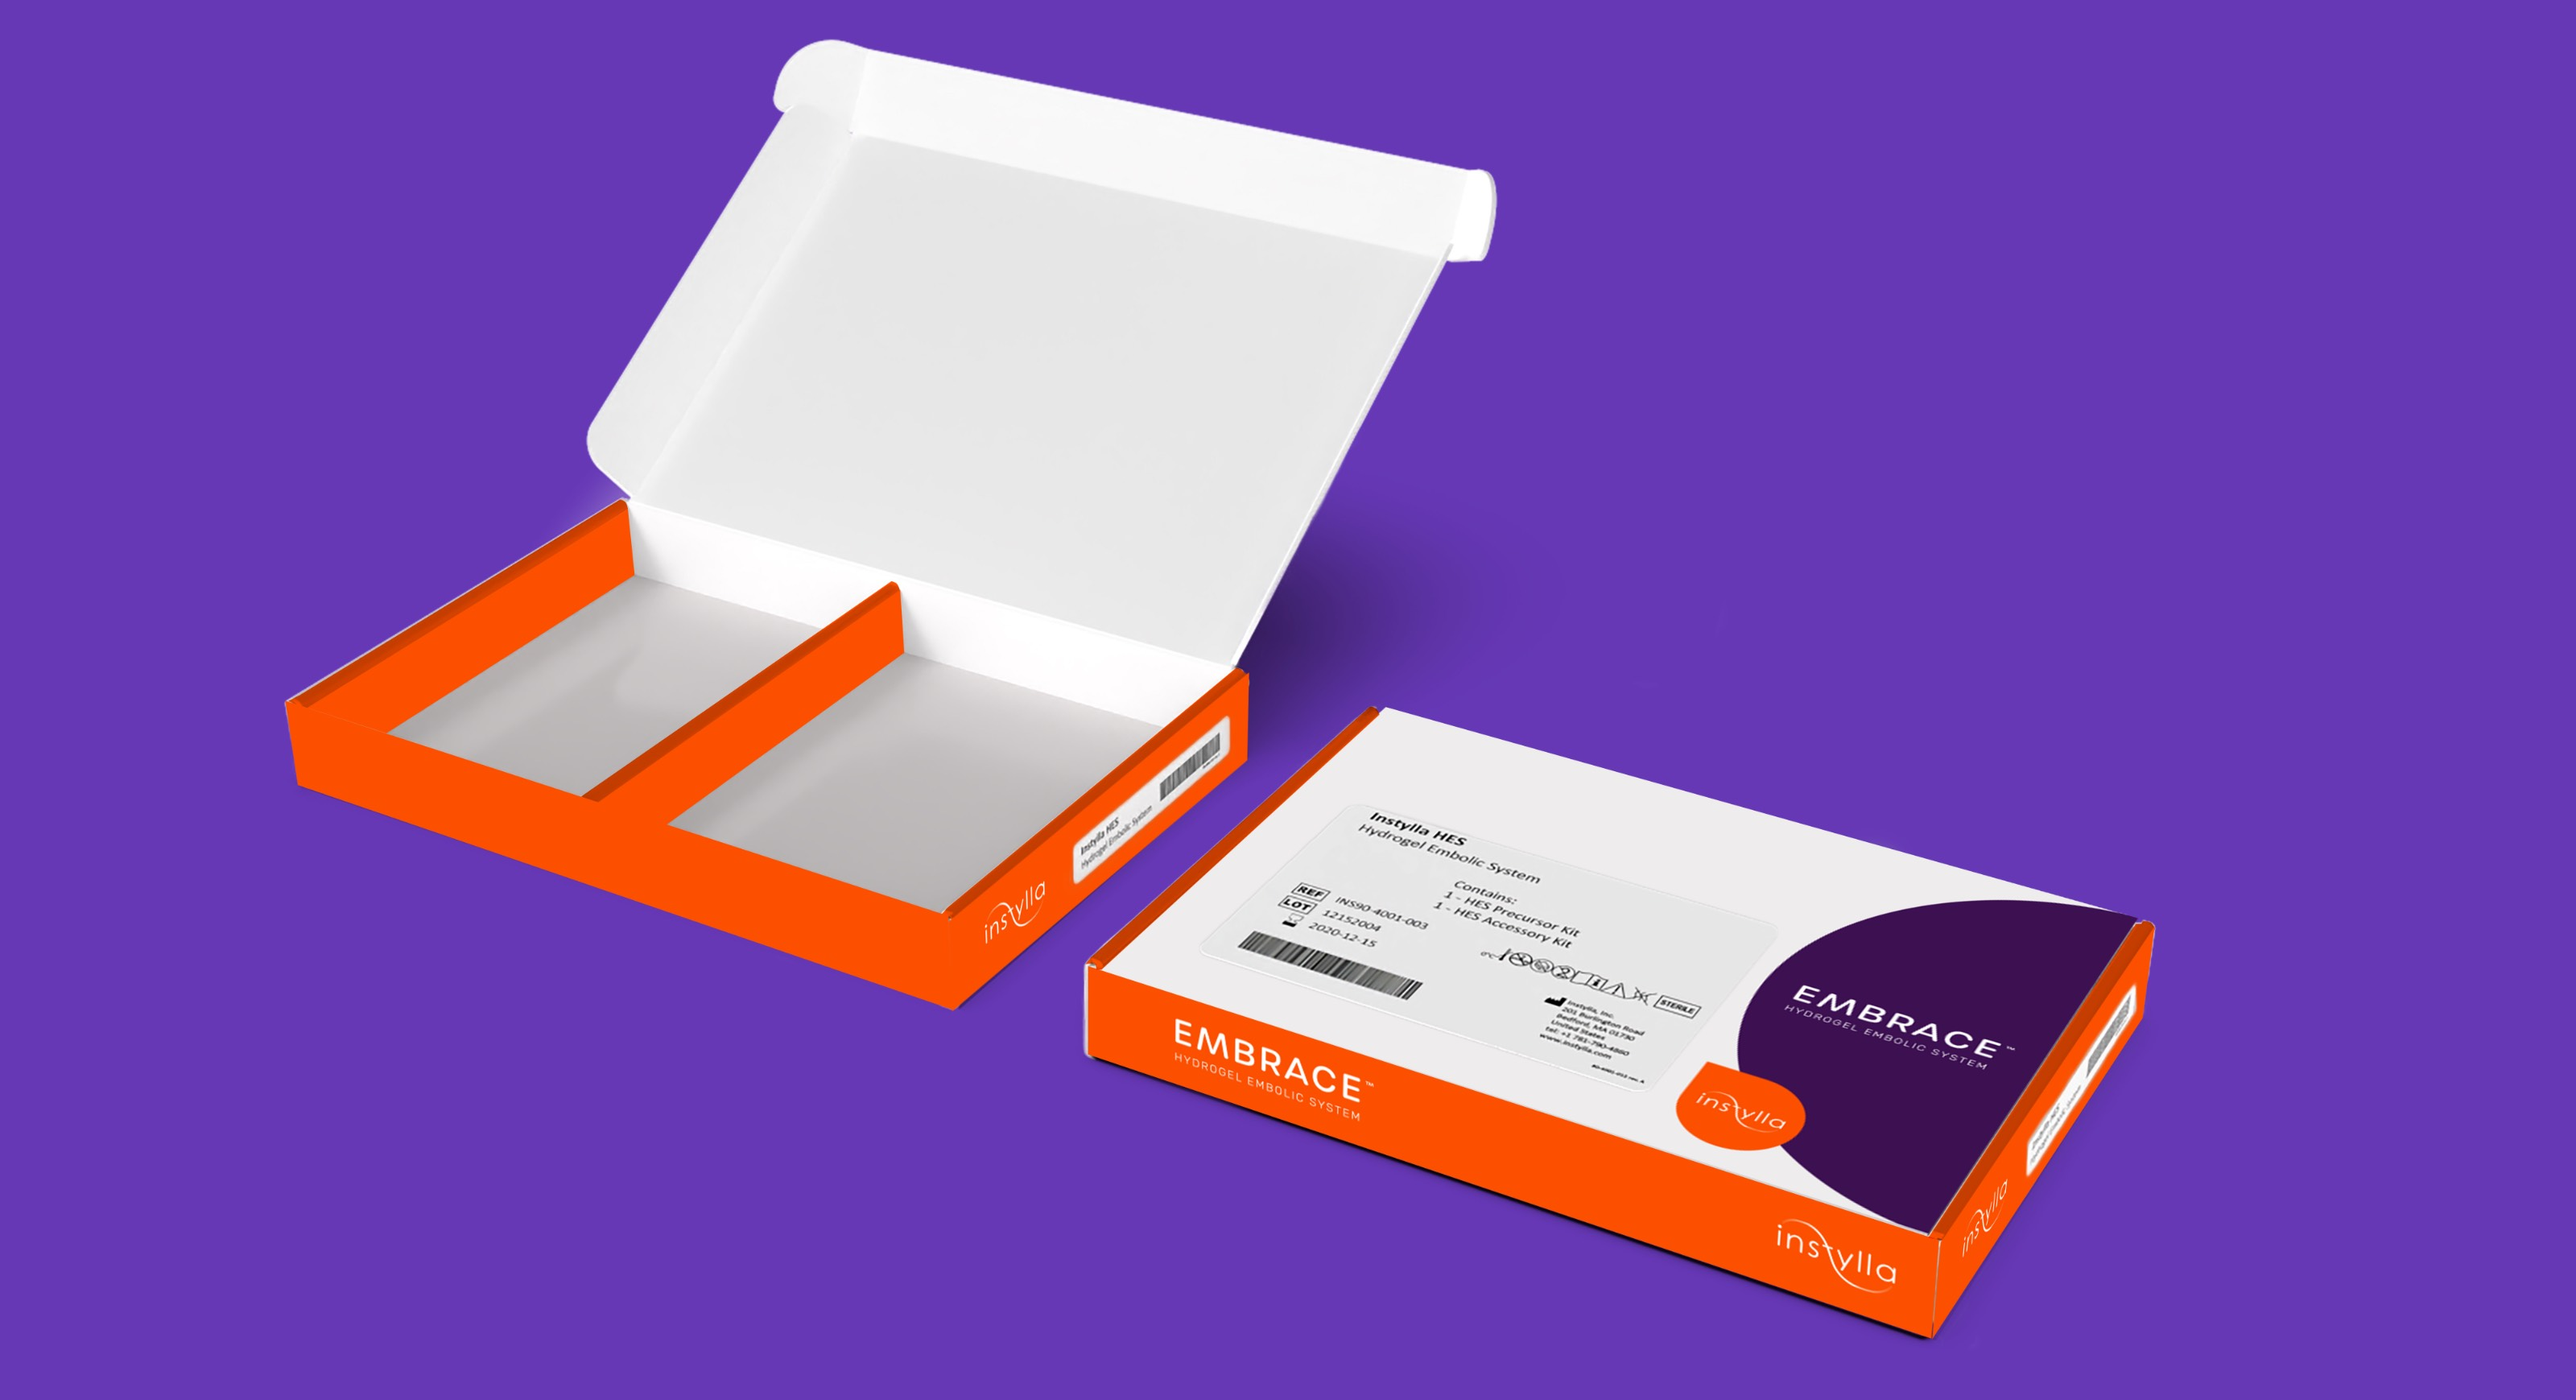 Instylla box design